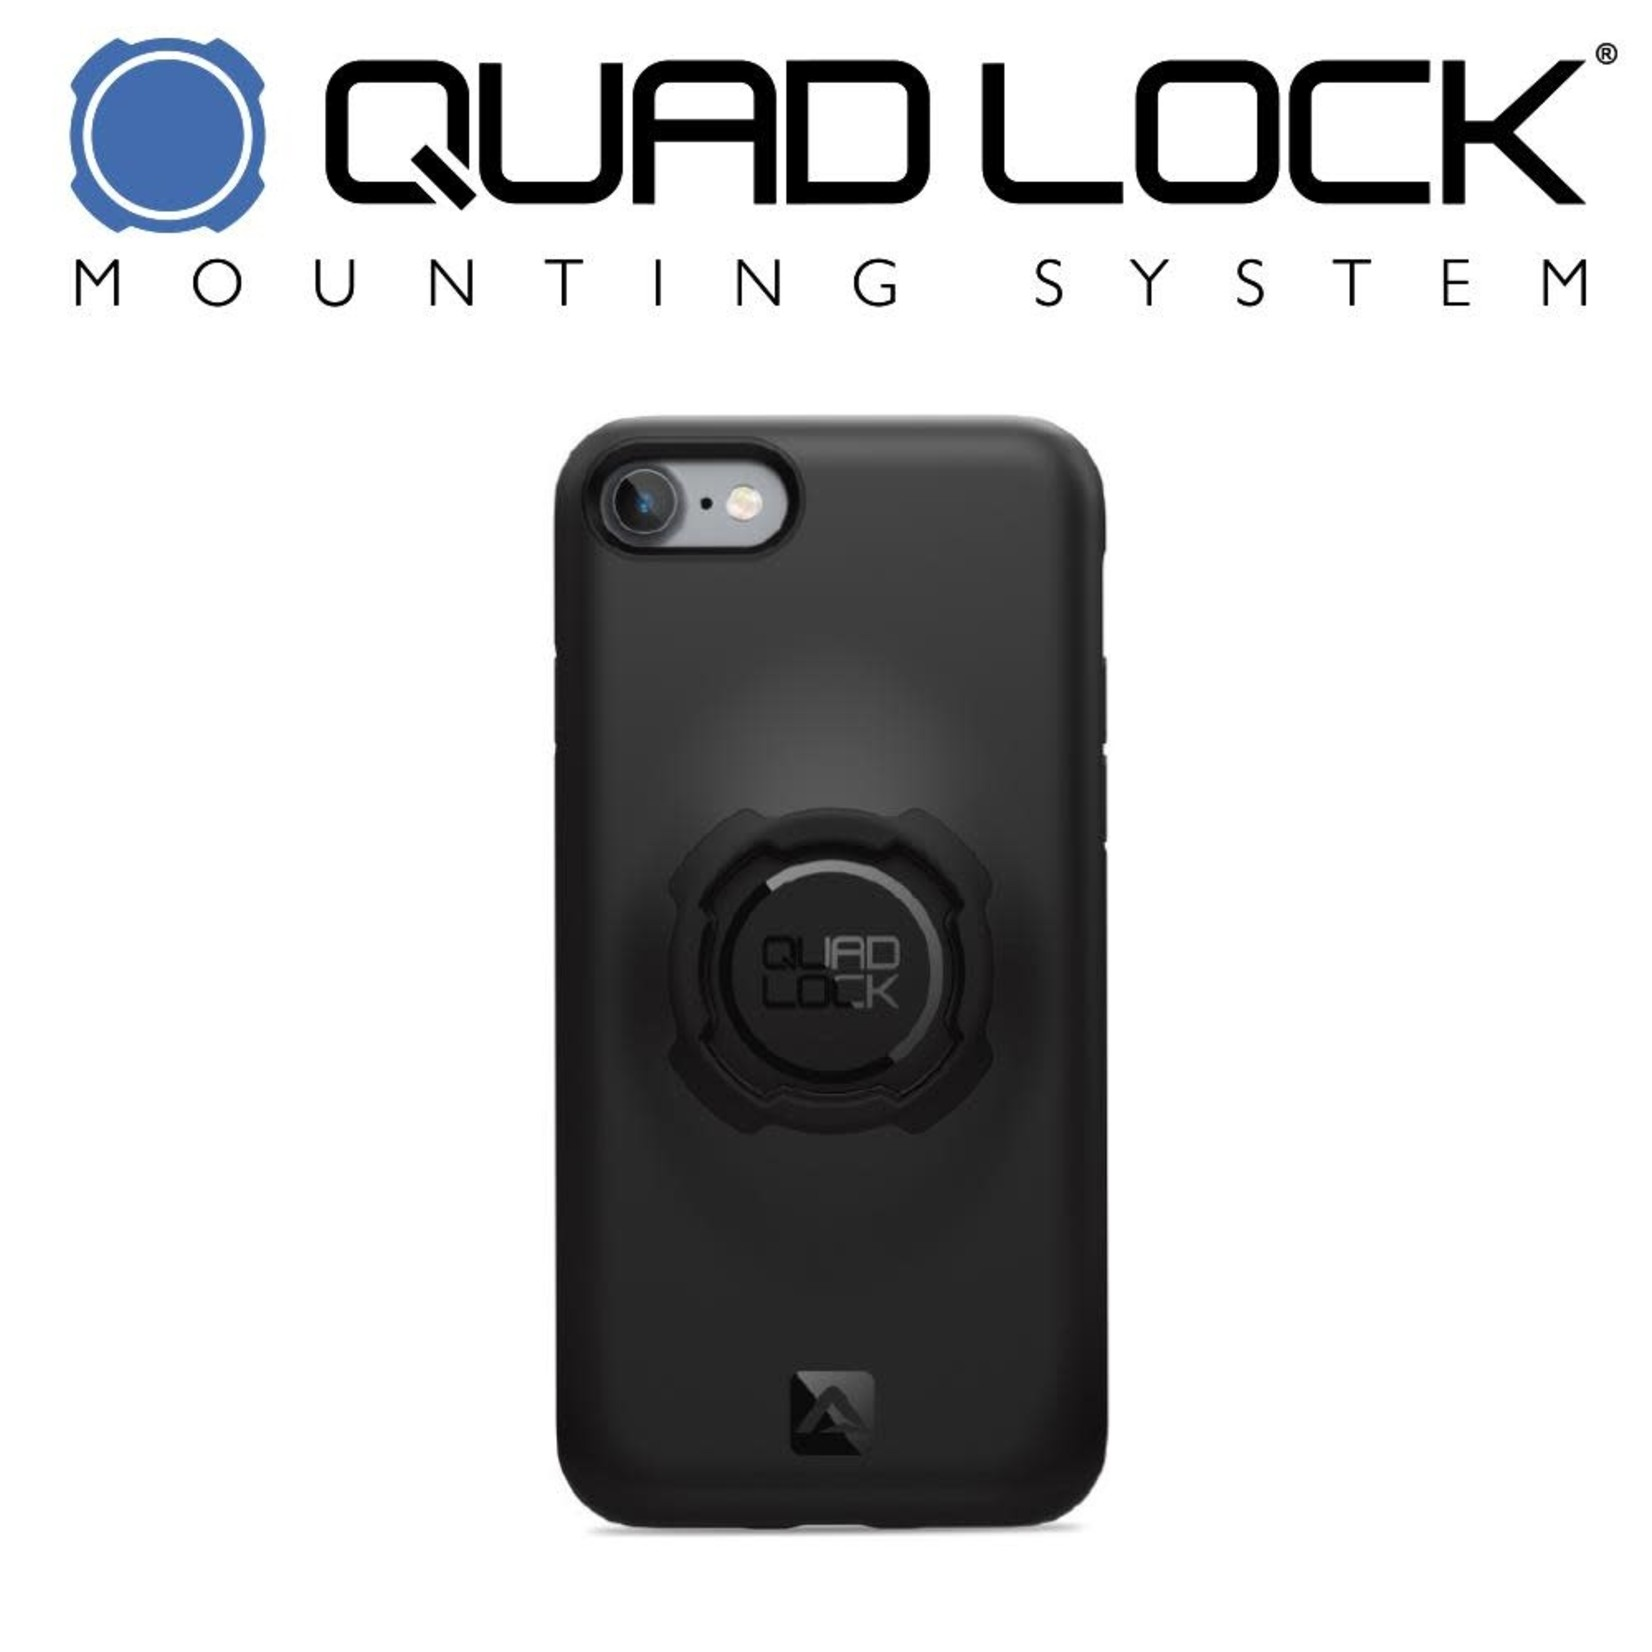 Quad Lock Iphone 7/8 SE(2nd Gen) Case